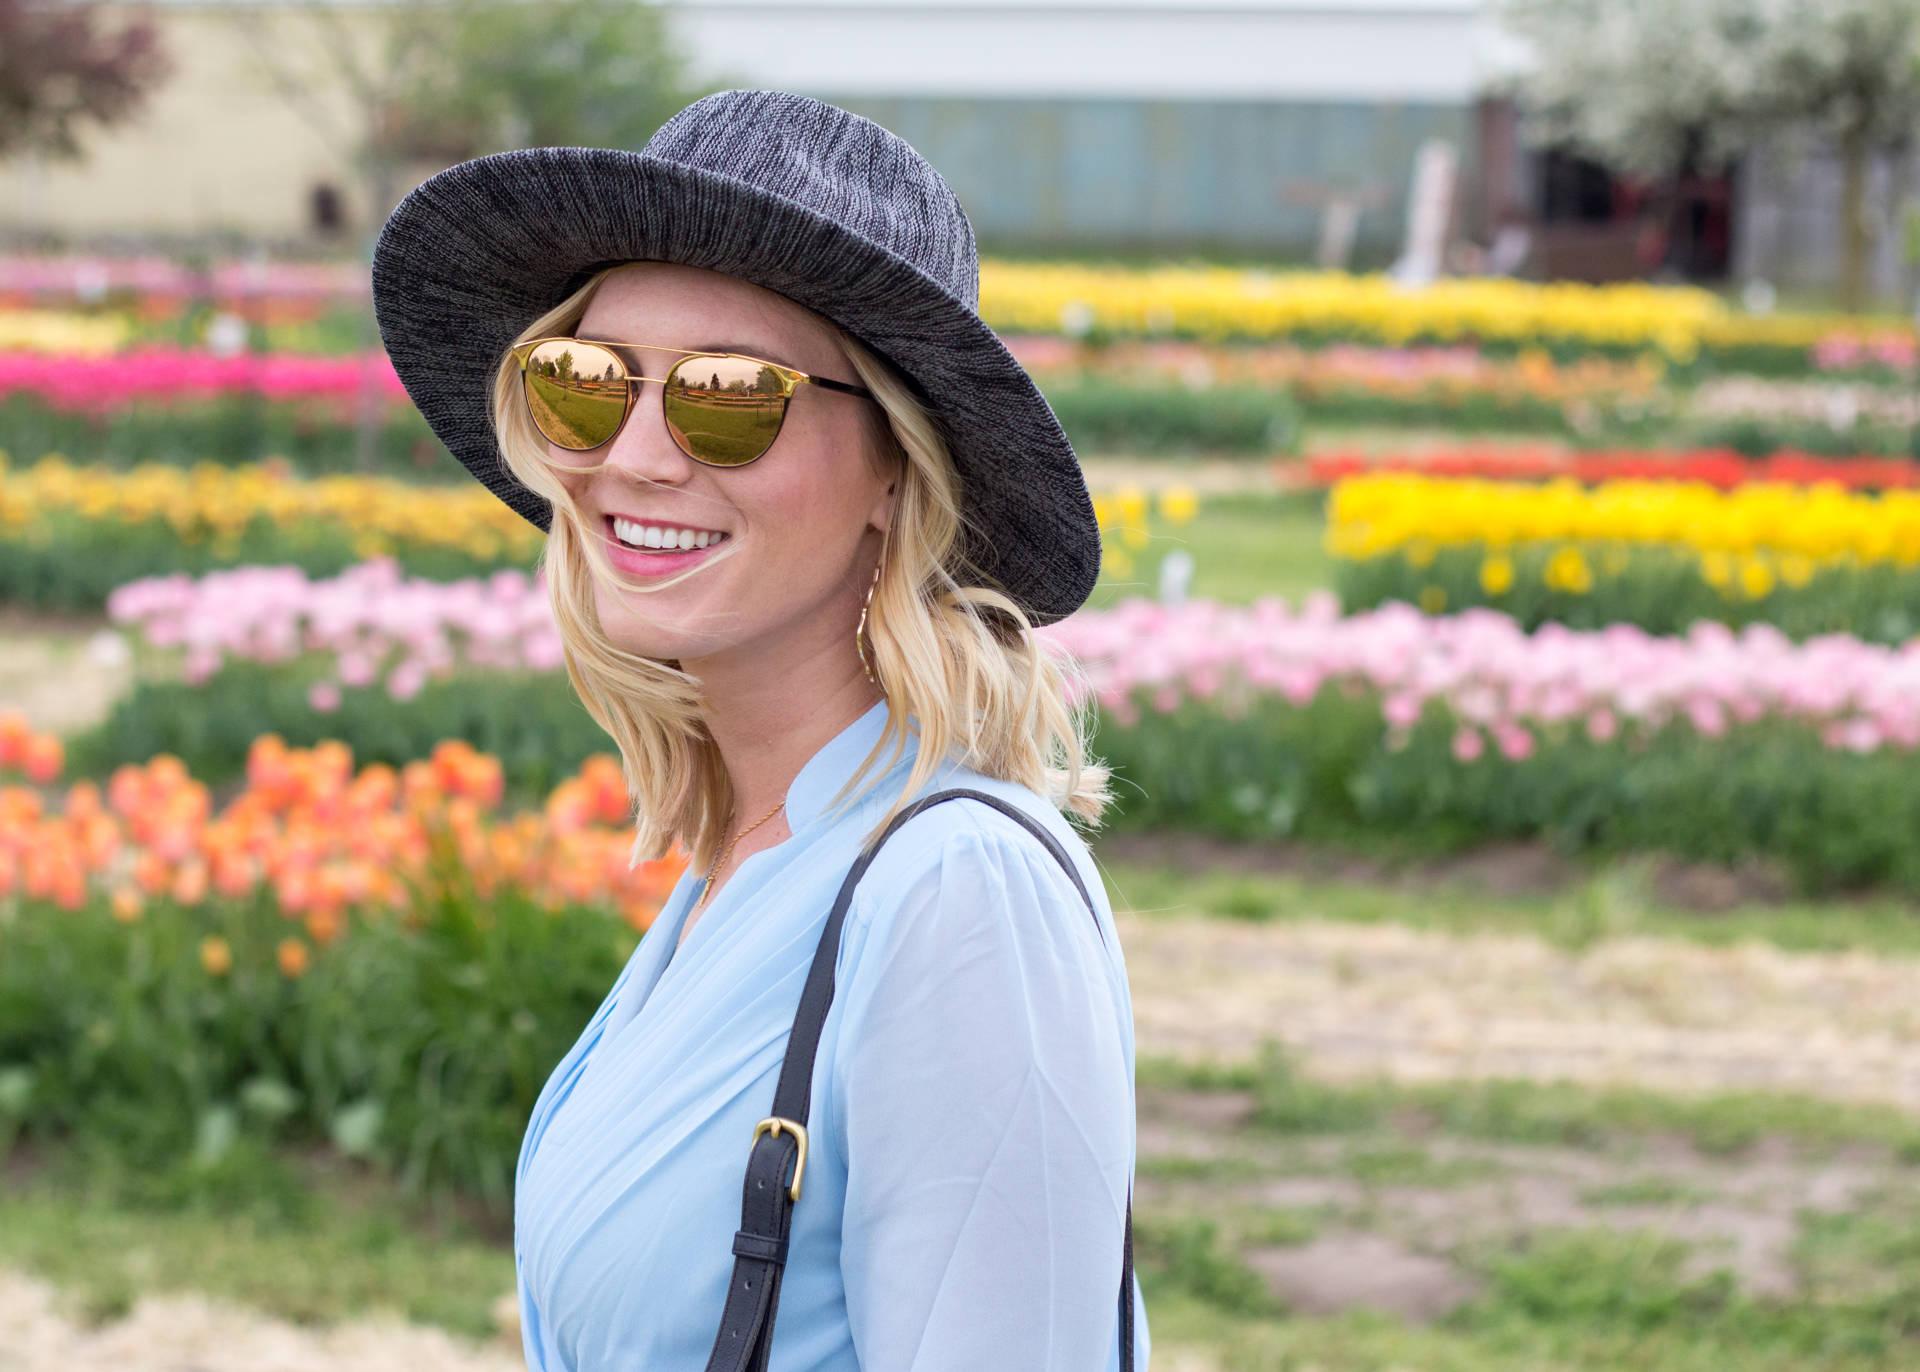 Linda Farrow Lfl 421 Sunglasses | DITTO Endless Eyewear